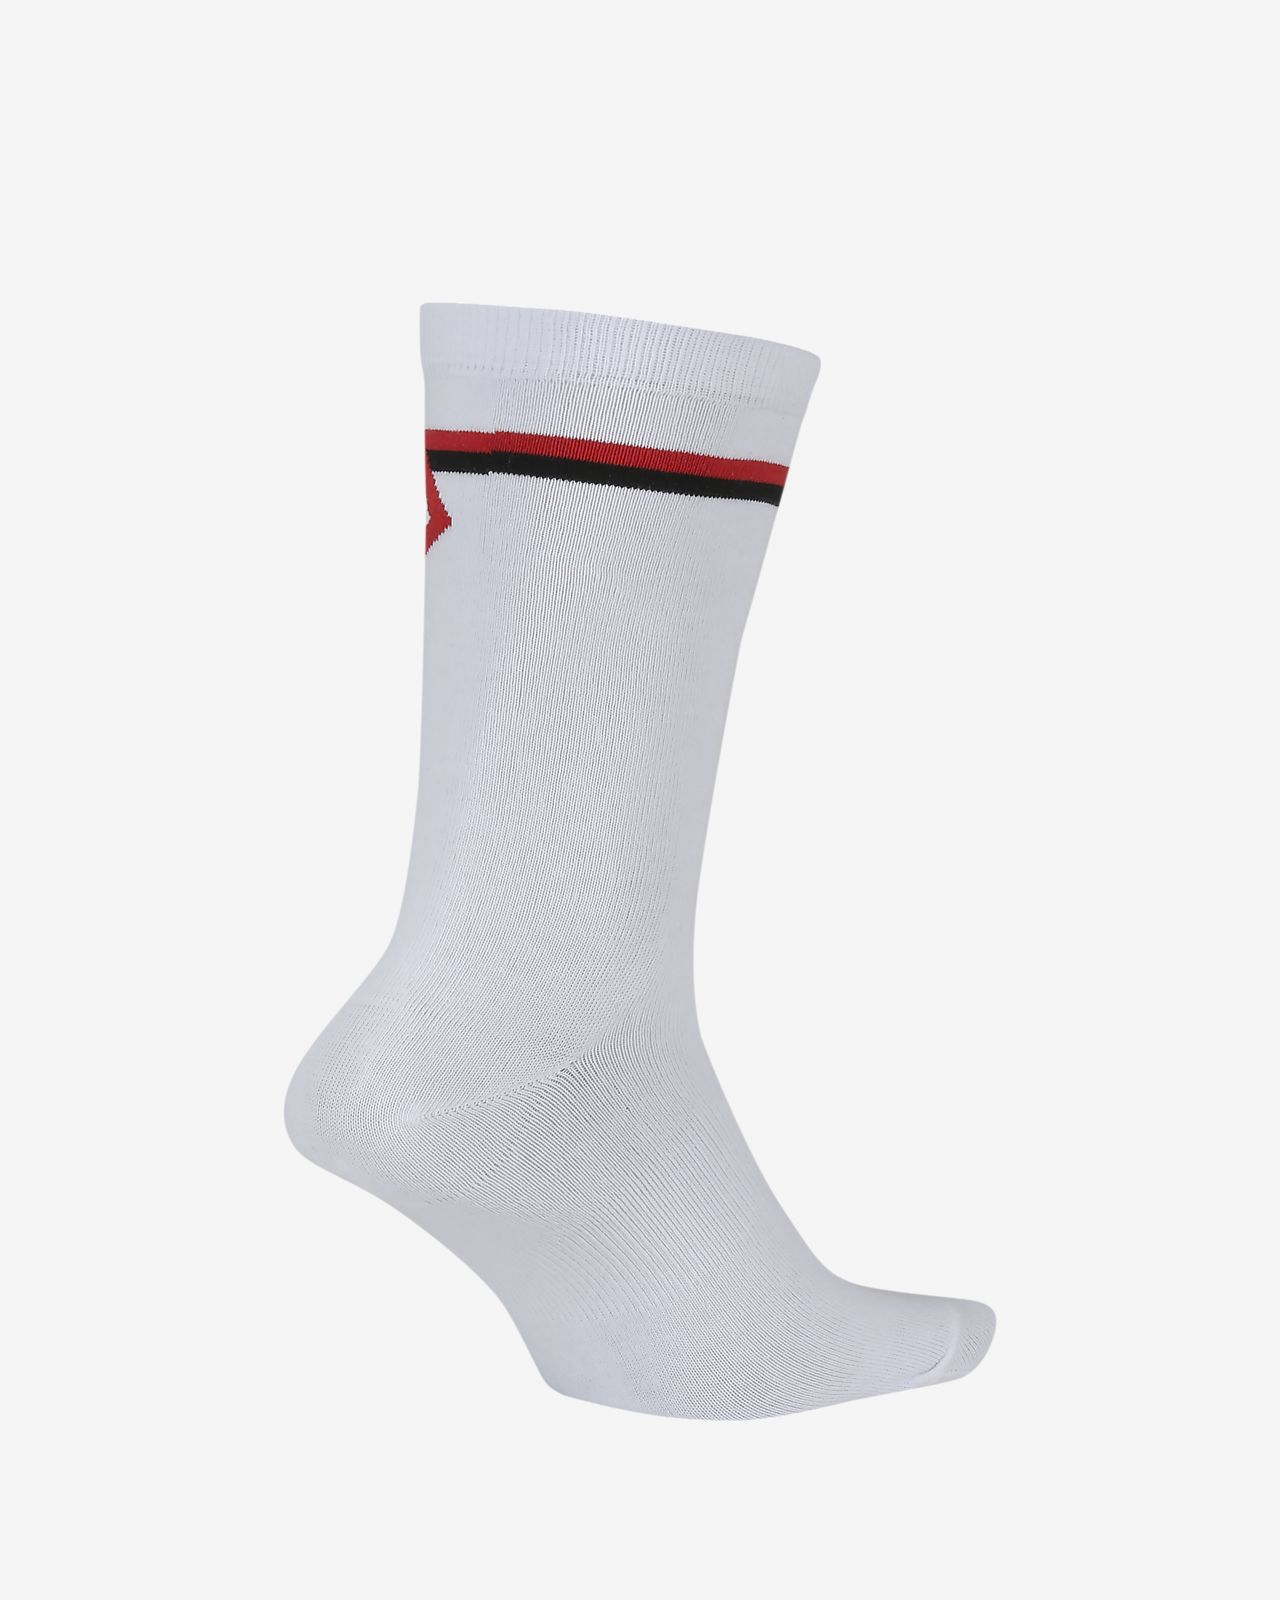 Jordan Legacy Diamond Crew Socks